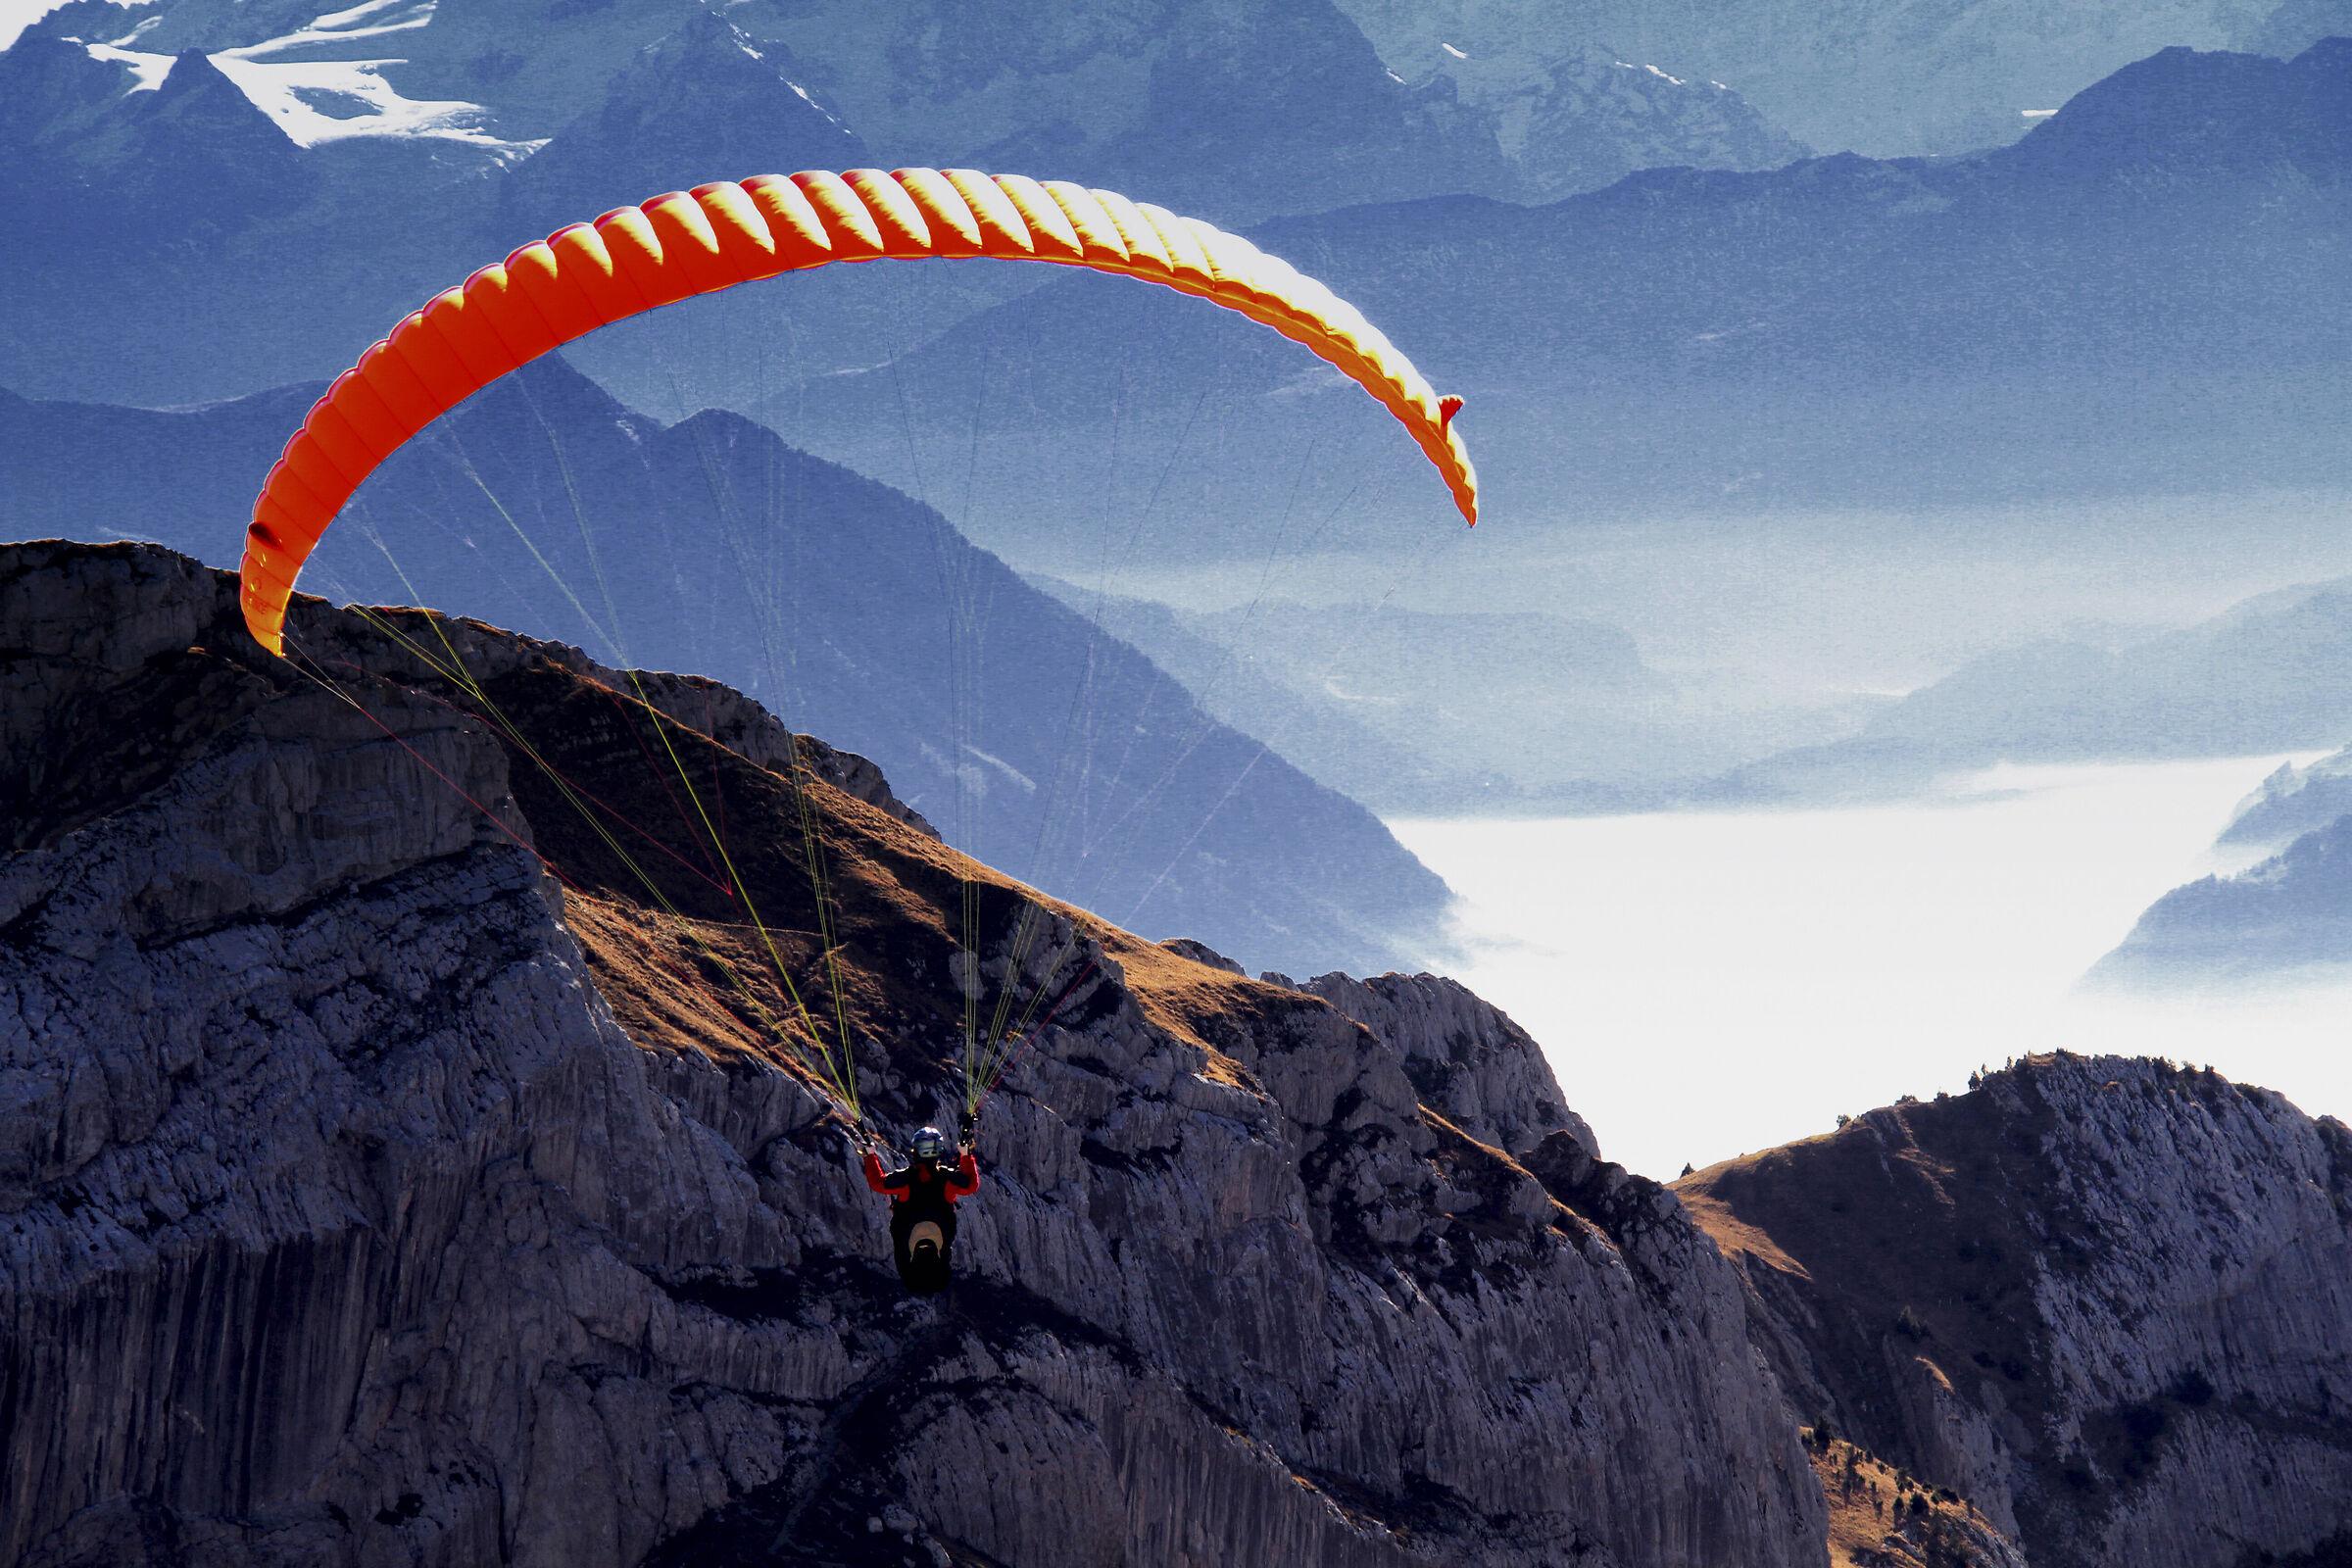 Paragliding on Mount Pilatus...